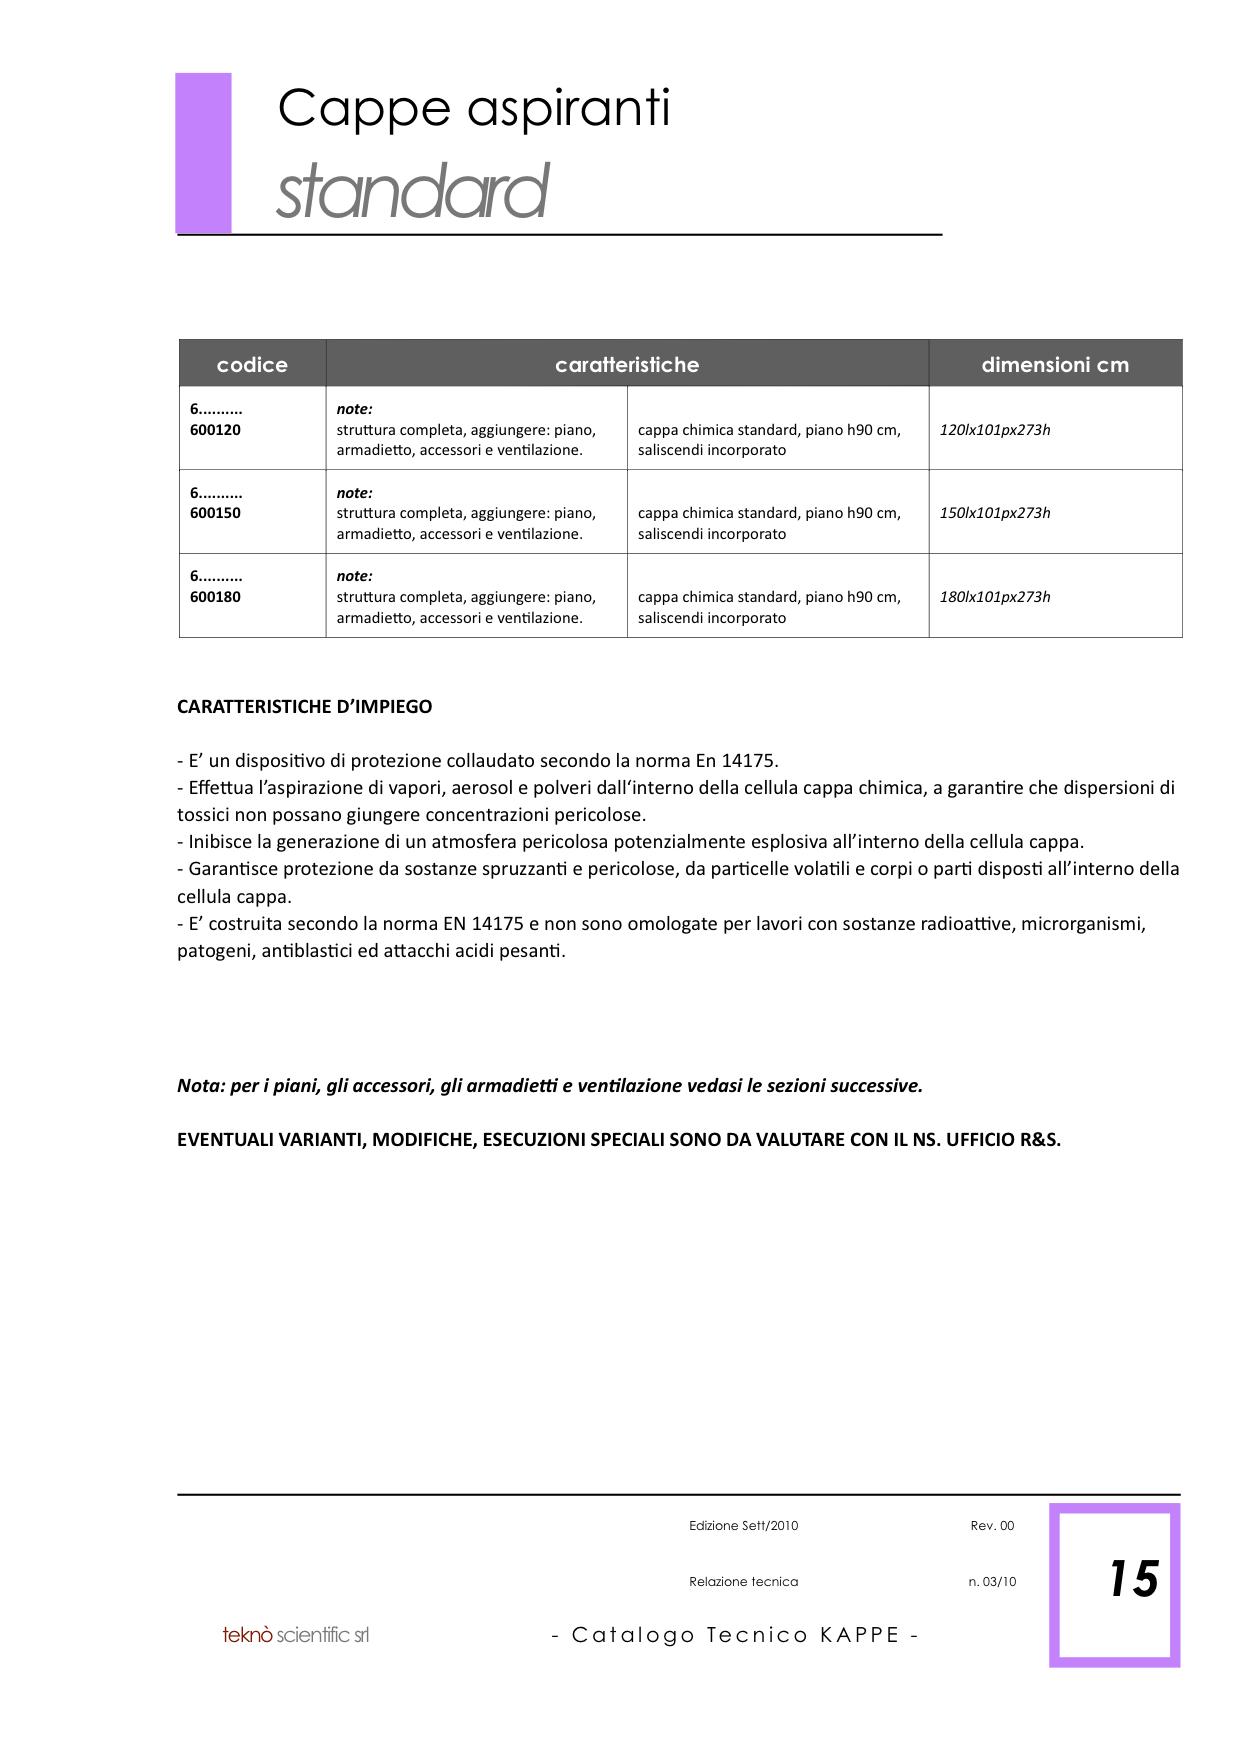 KAPPE Catalogo Tecnico Generale copia 15.png